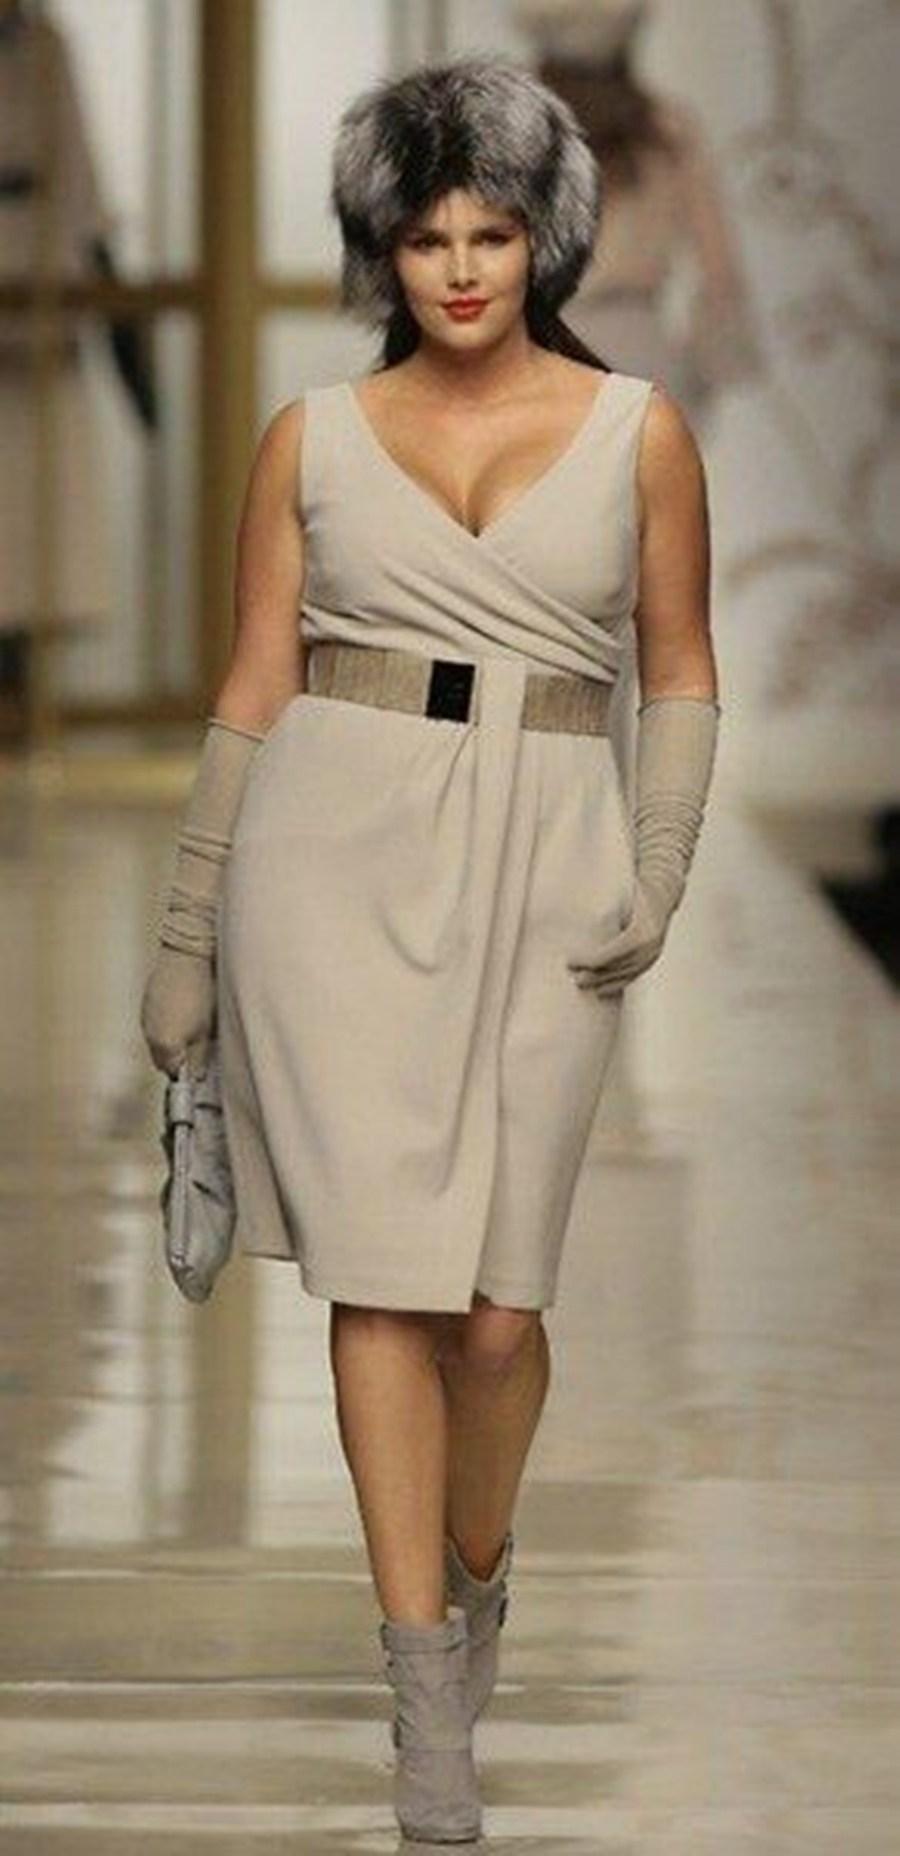 08-moda-curvy-vestido-reto